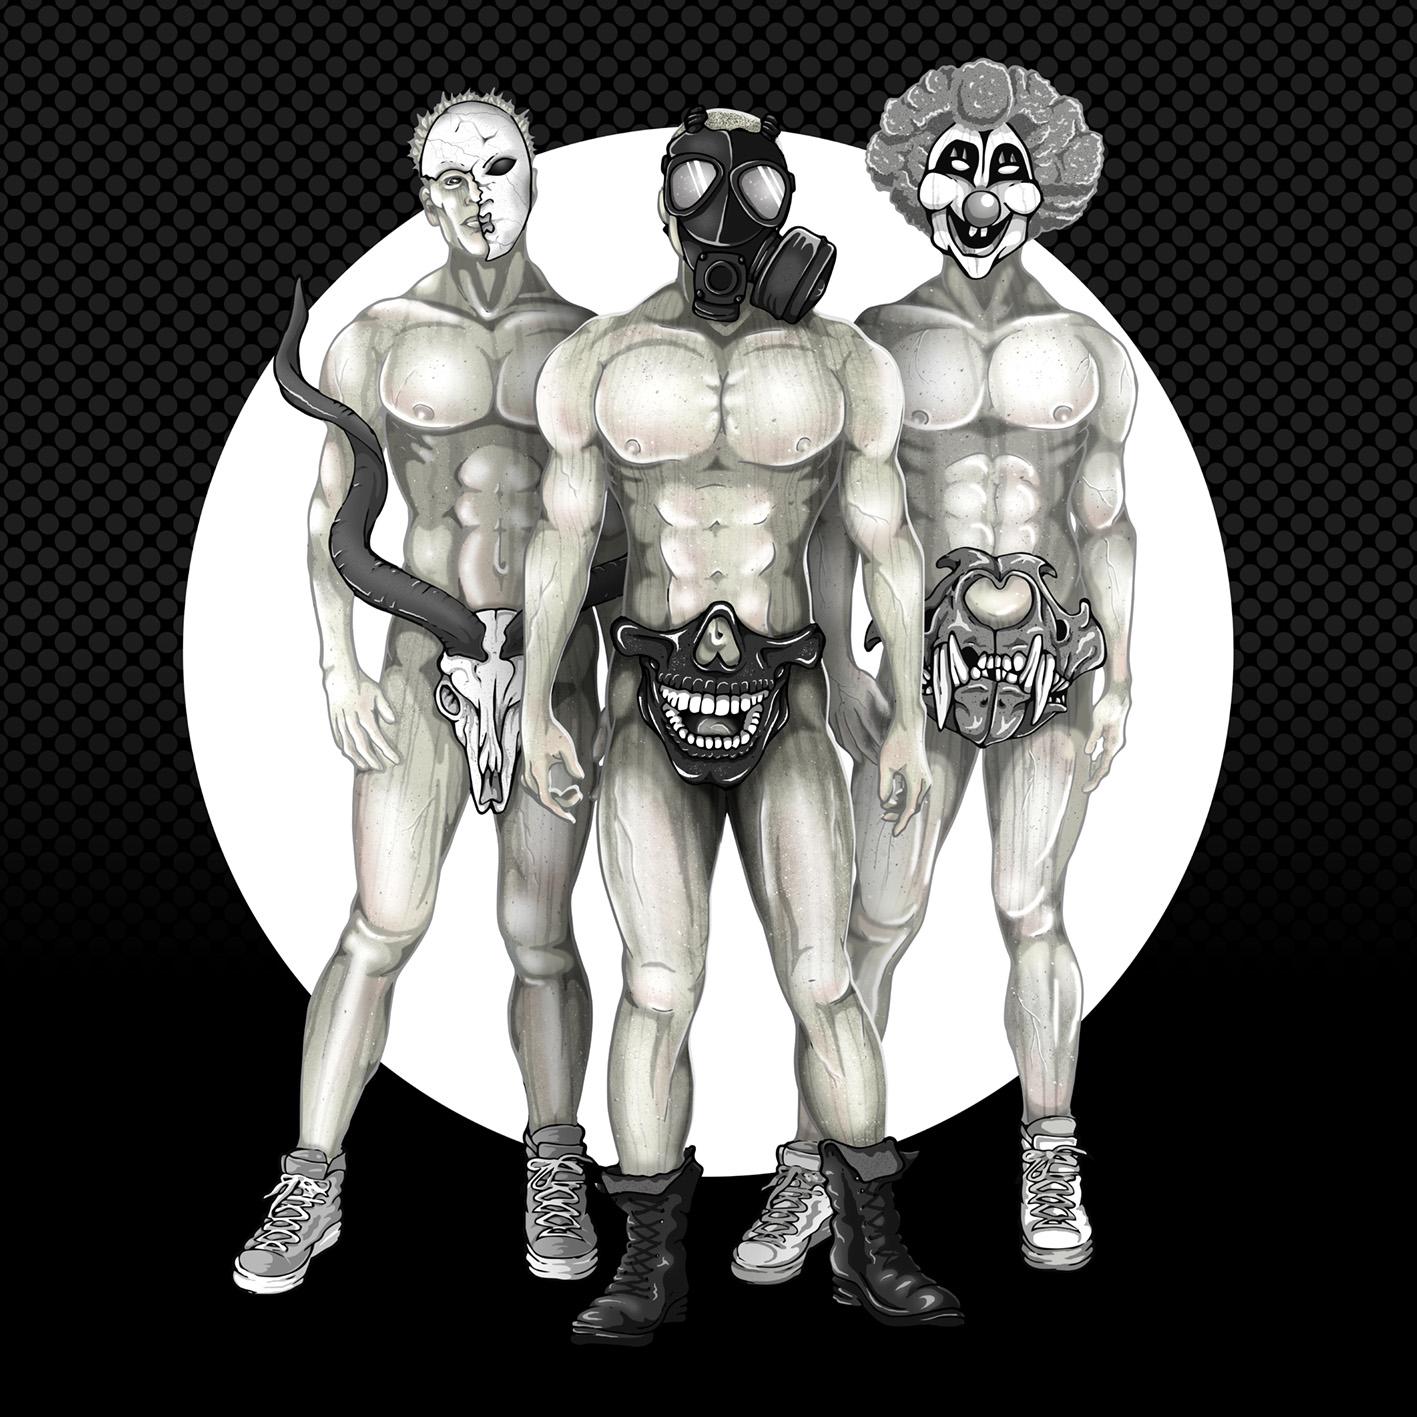 Original illustration. Inks in Illustrator. Paint in Photoshop.